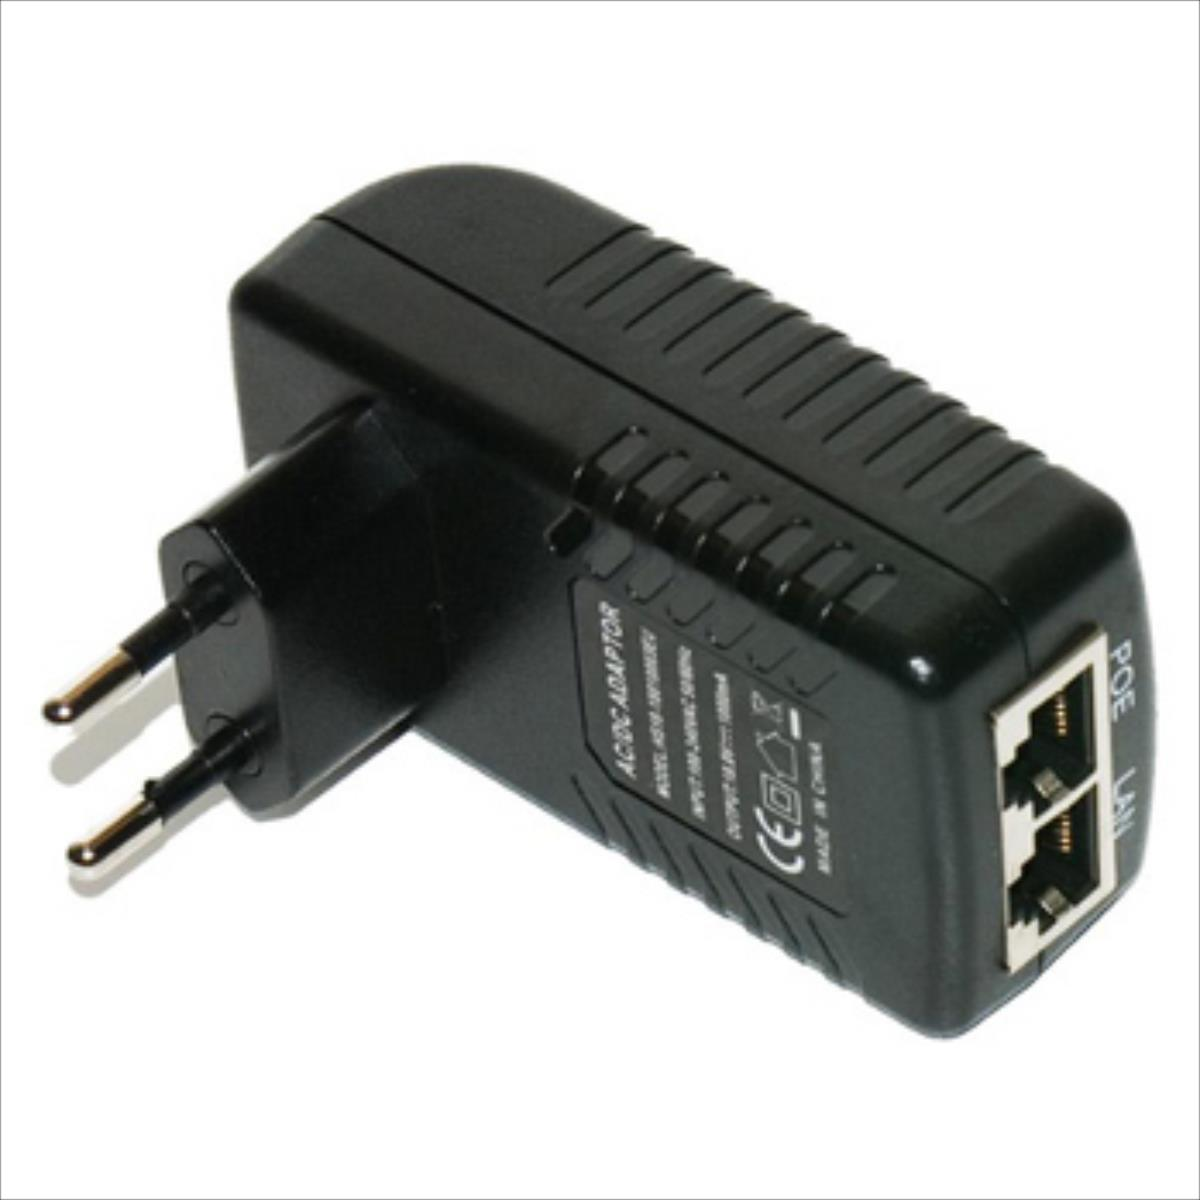 MikroTik Power Adapter with PoE 12V 1A tīkla iekārta